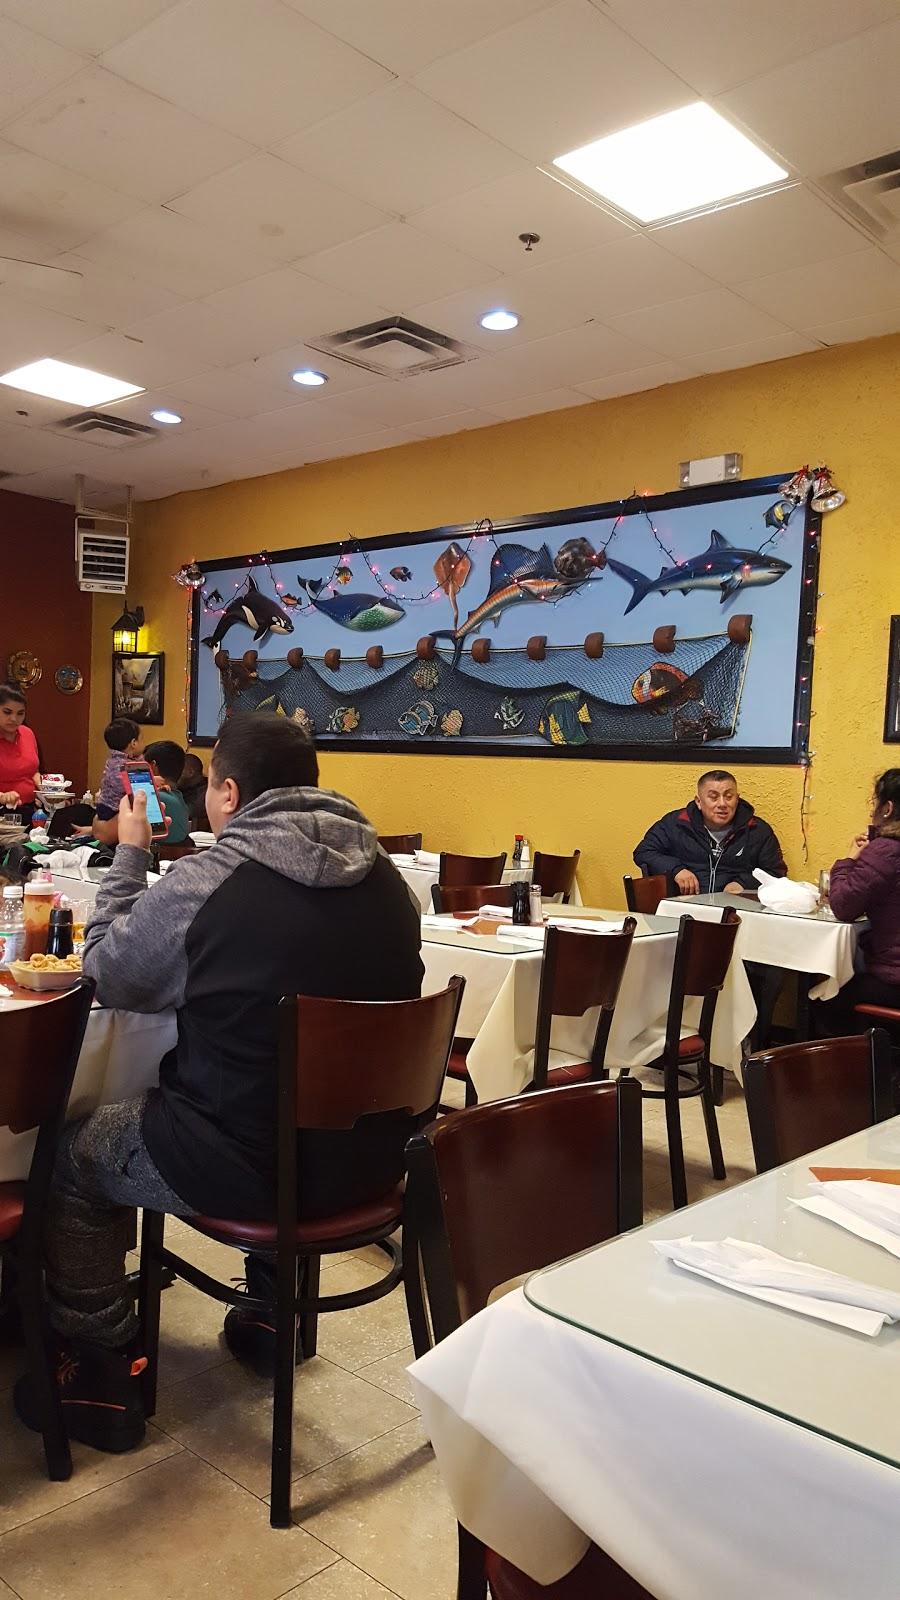 Don Julio - restaurant    Photo 1 of 10   Address: 50 Marshall St, Elizabeth, NJ 07206, USA   Phone: (908) 820-0100